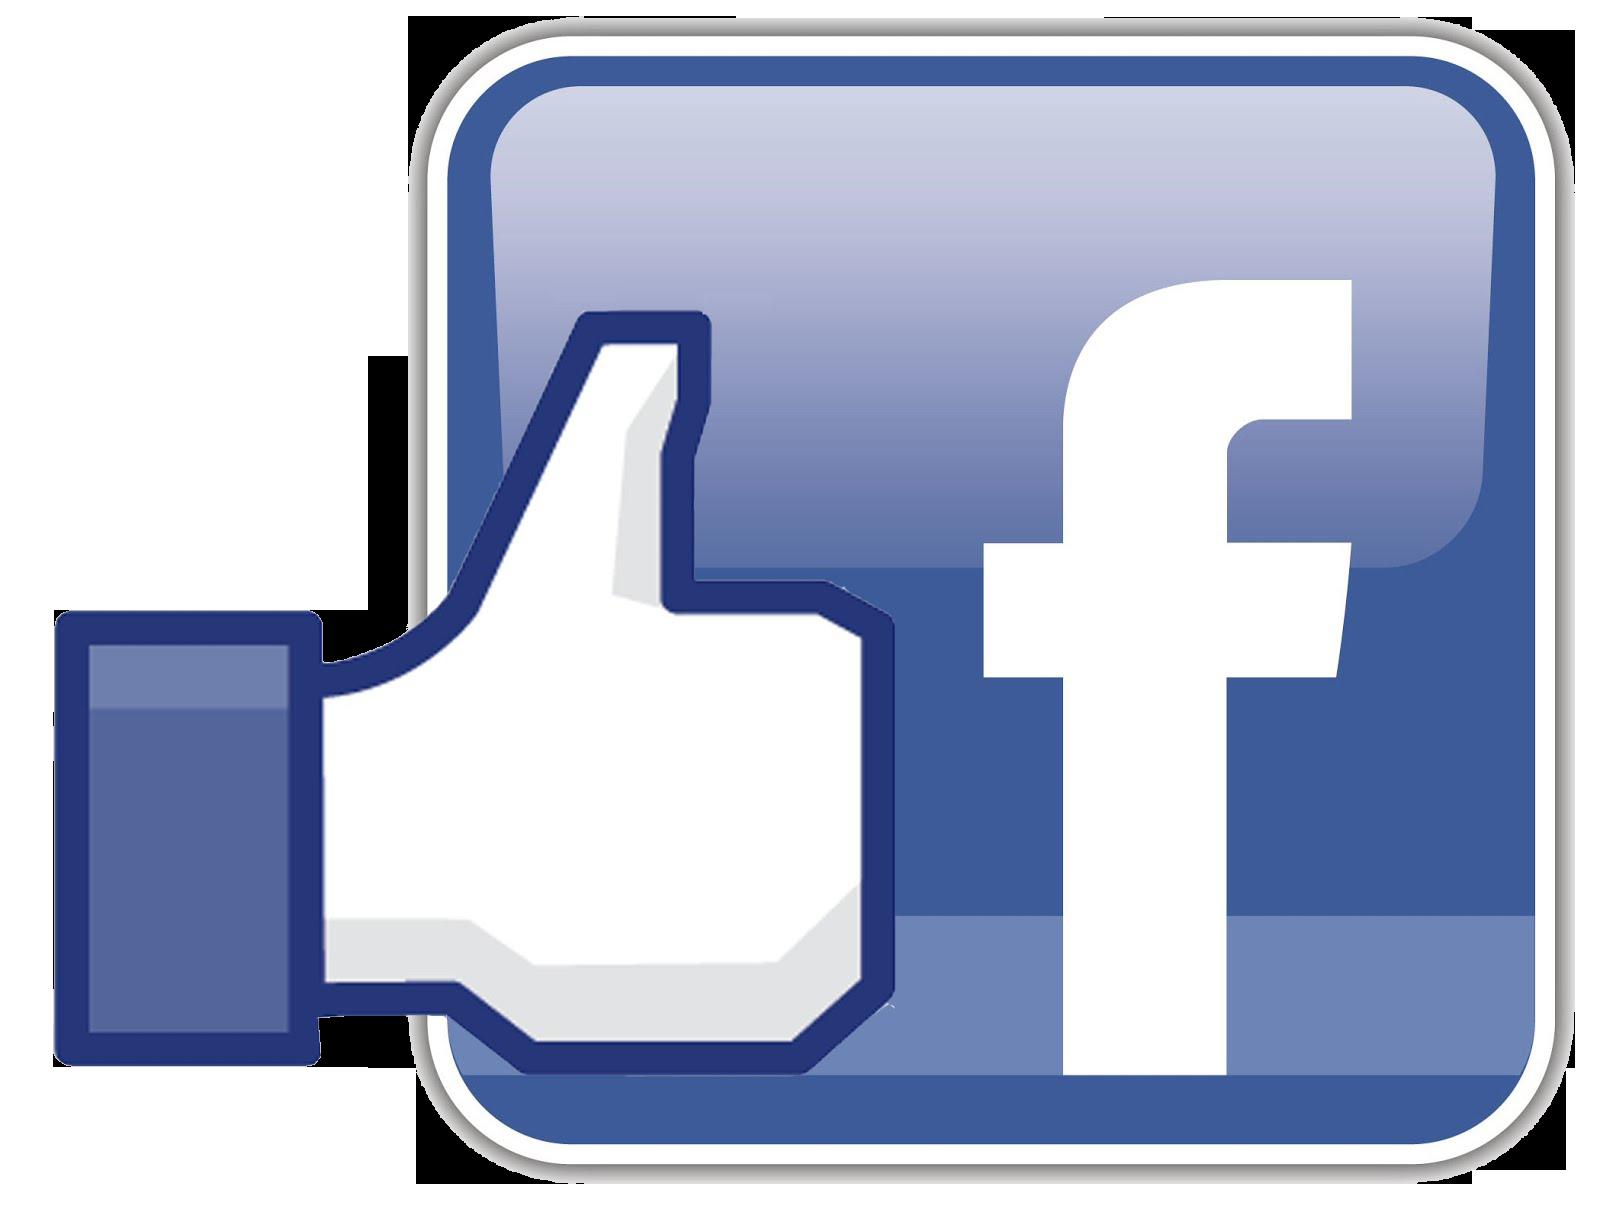 Facebook transparent clipart.